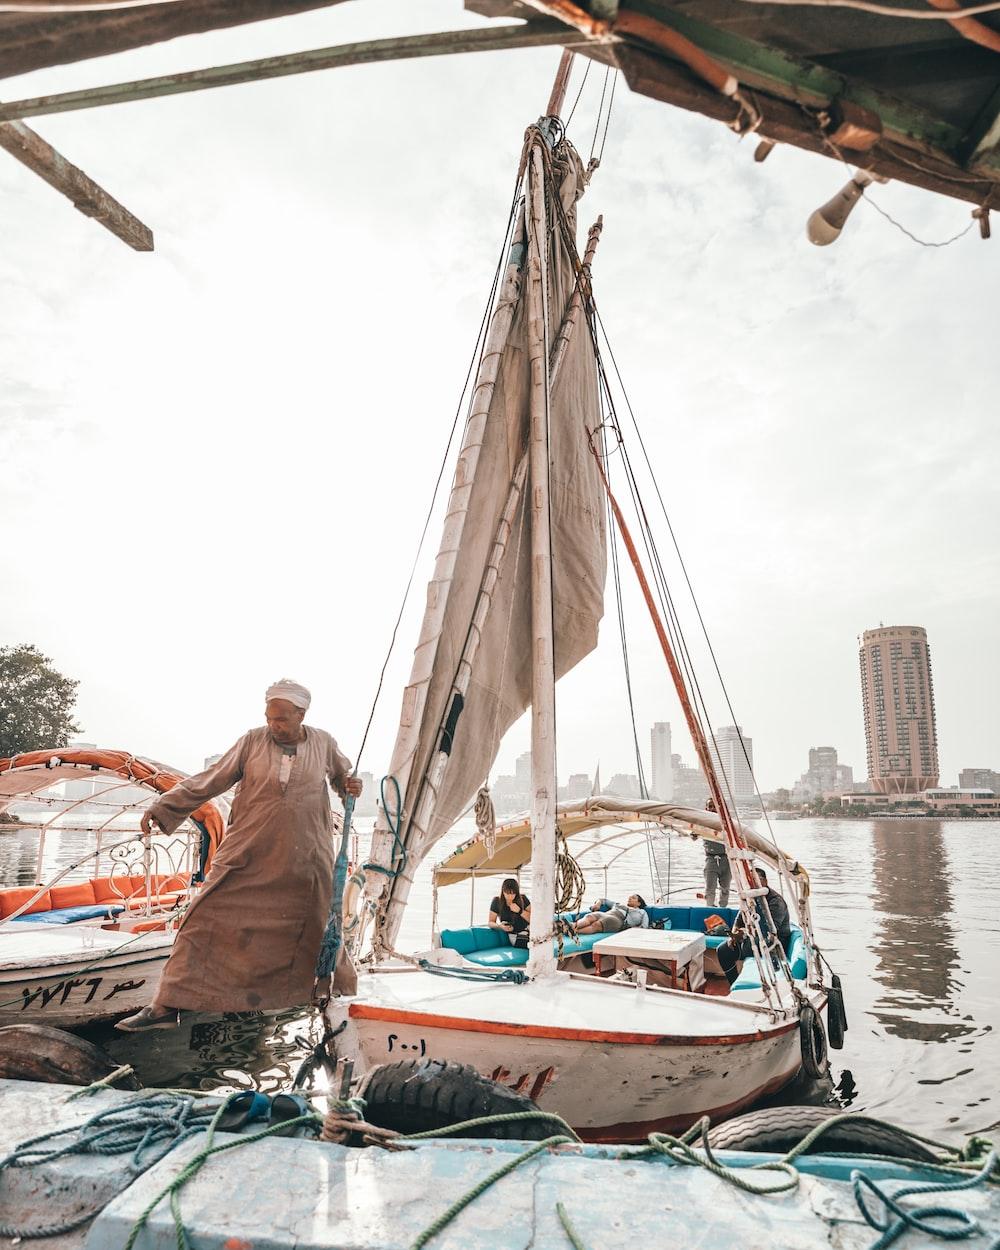 man standing near sailing boat